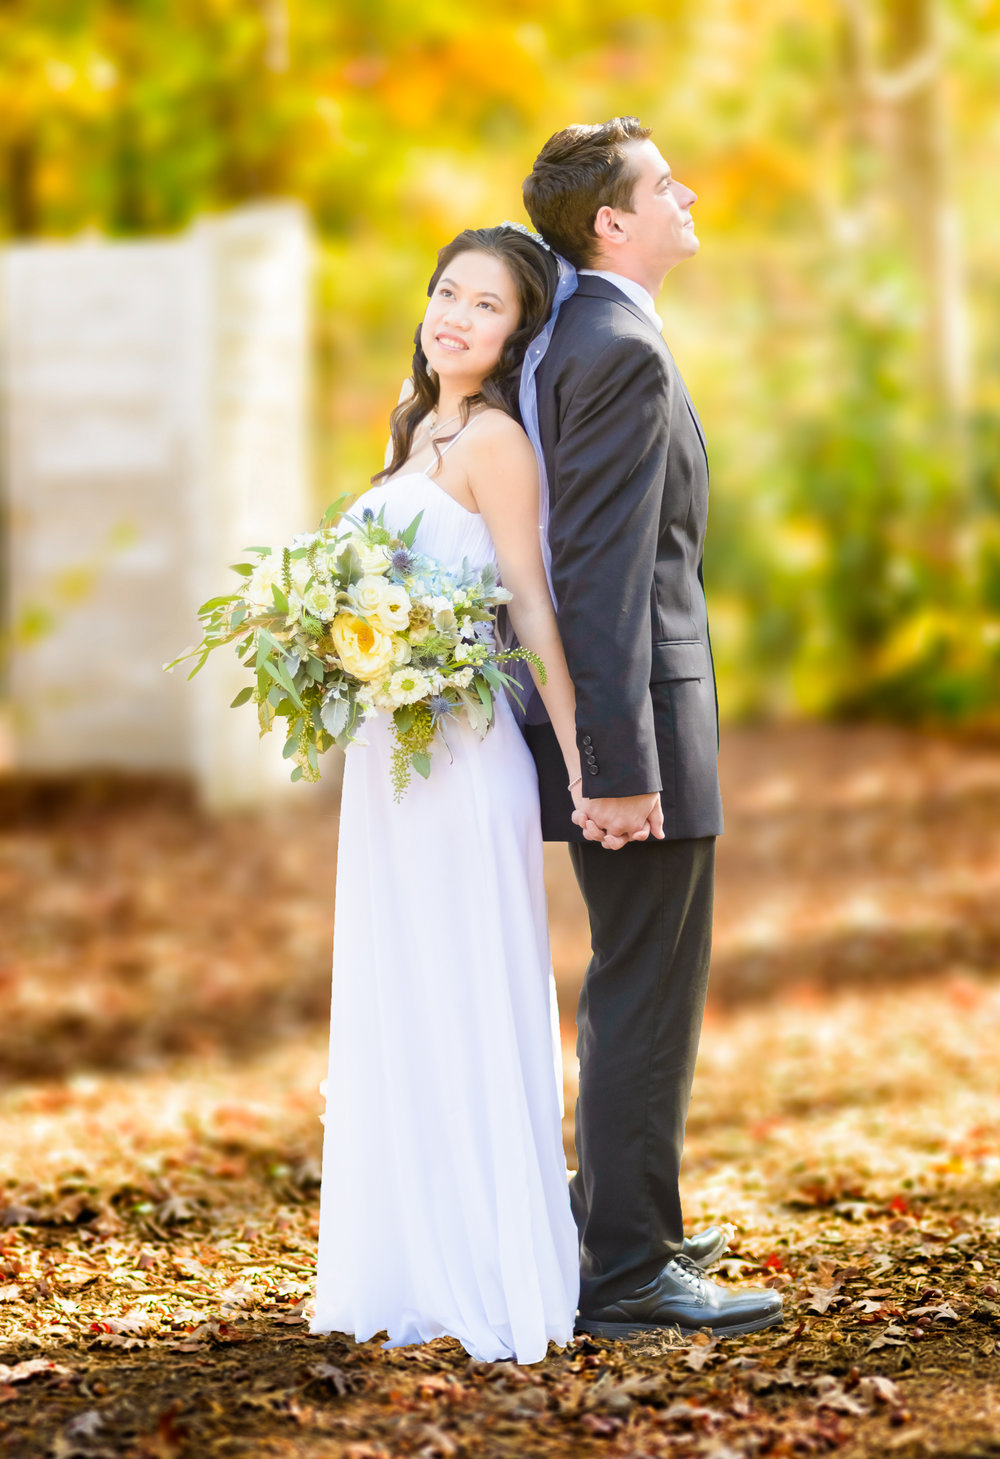 wedding_ceremony-113.jpg